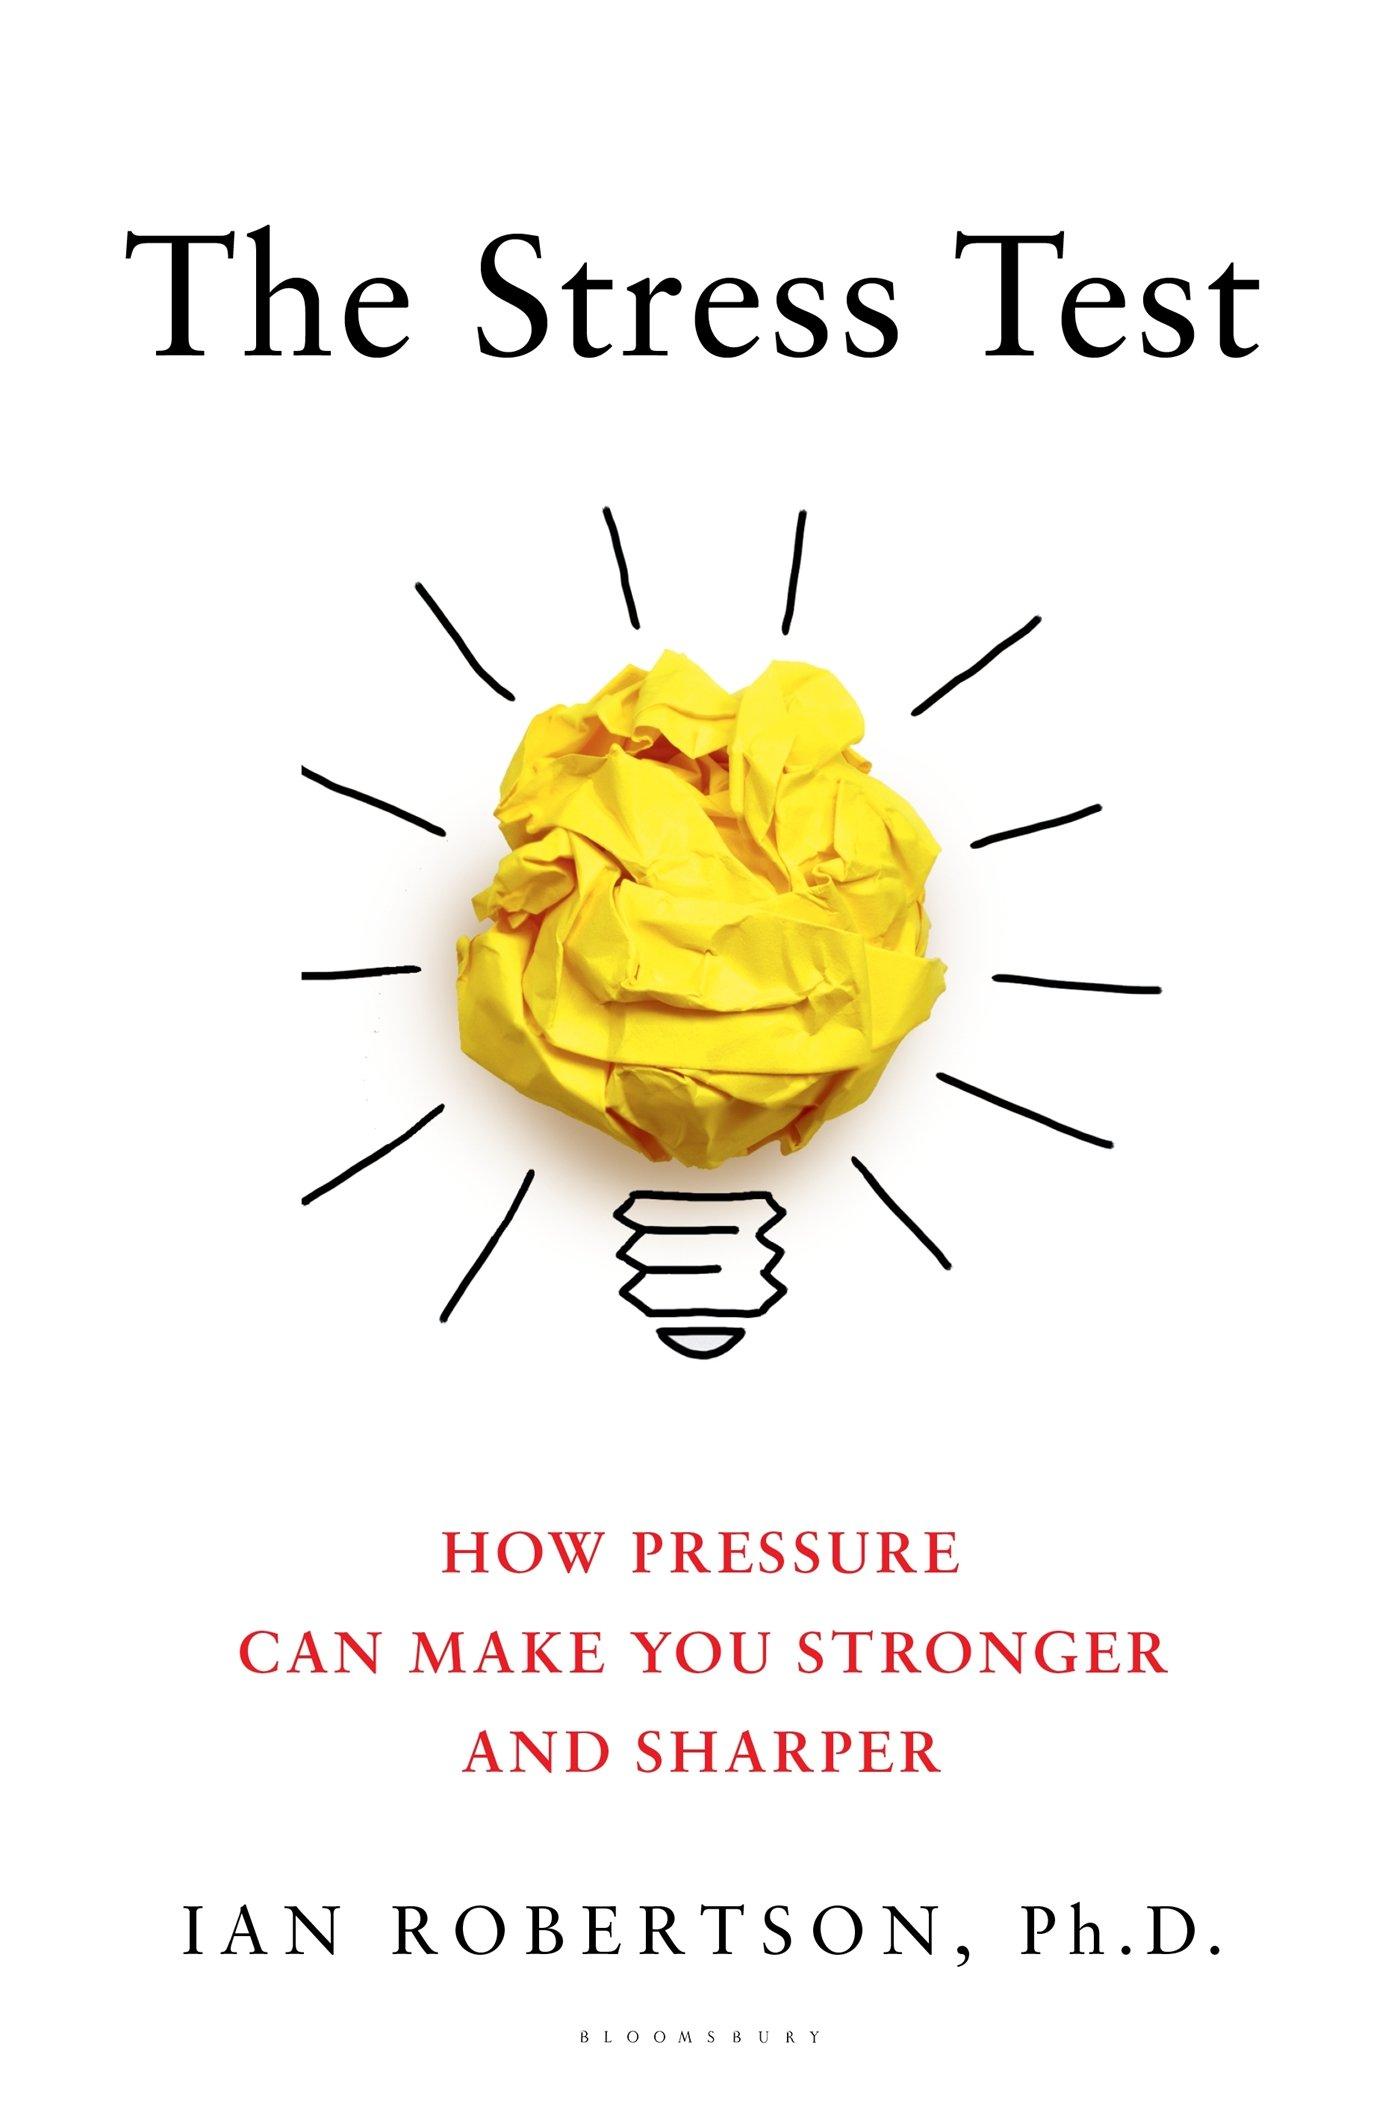 Stress Test Pressure Stronger Sharper product image